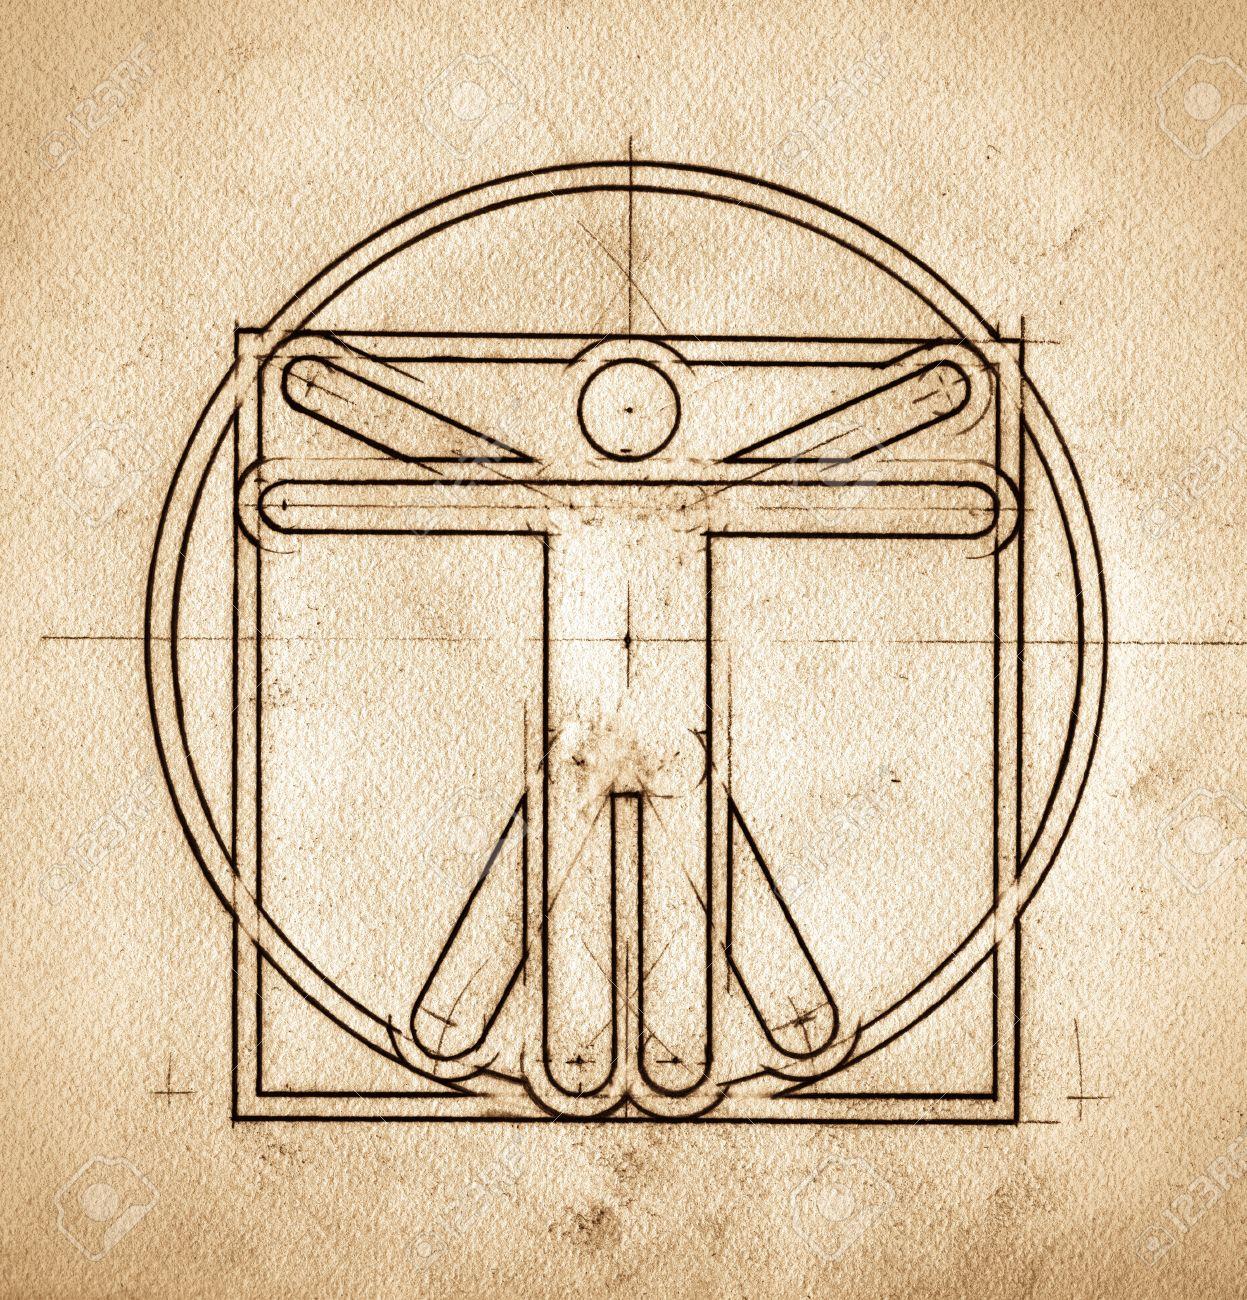 Grunge technical minimalistic design mimicking Leonardo da Vinci Vitruvian Man Standard-Bild - 18537210